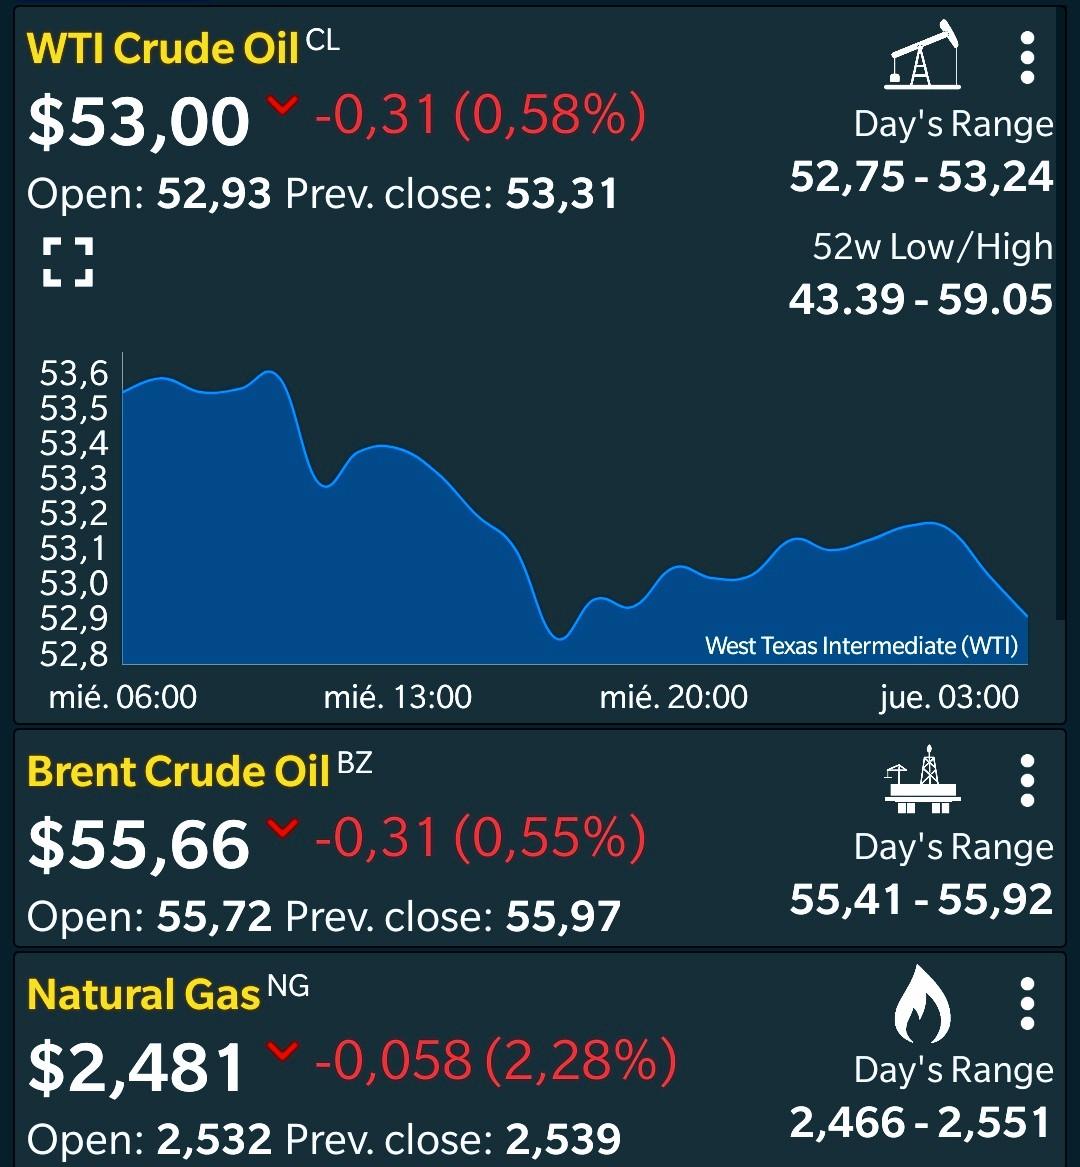 Muy buenos días amigos. A continuación los precios del petróleo y gas natural a esta hora #WTI #Brent #NaturalGas #21Enero #oilprice #petroleo #BuenosDias #FelizJueves #thursdaymorning #thursdayvibes #business #BreakingNews